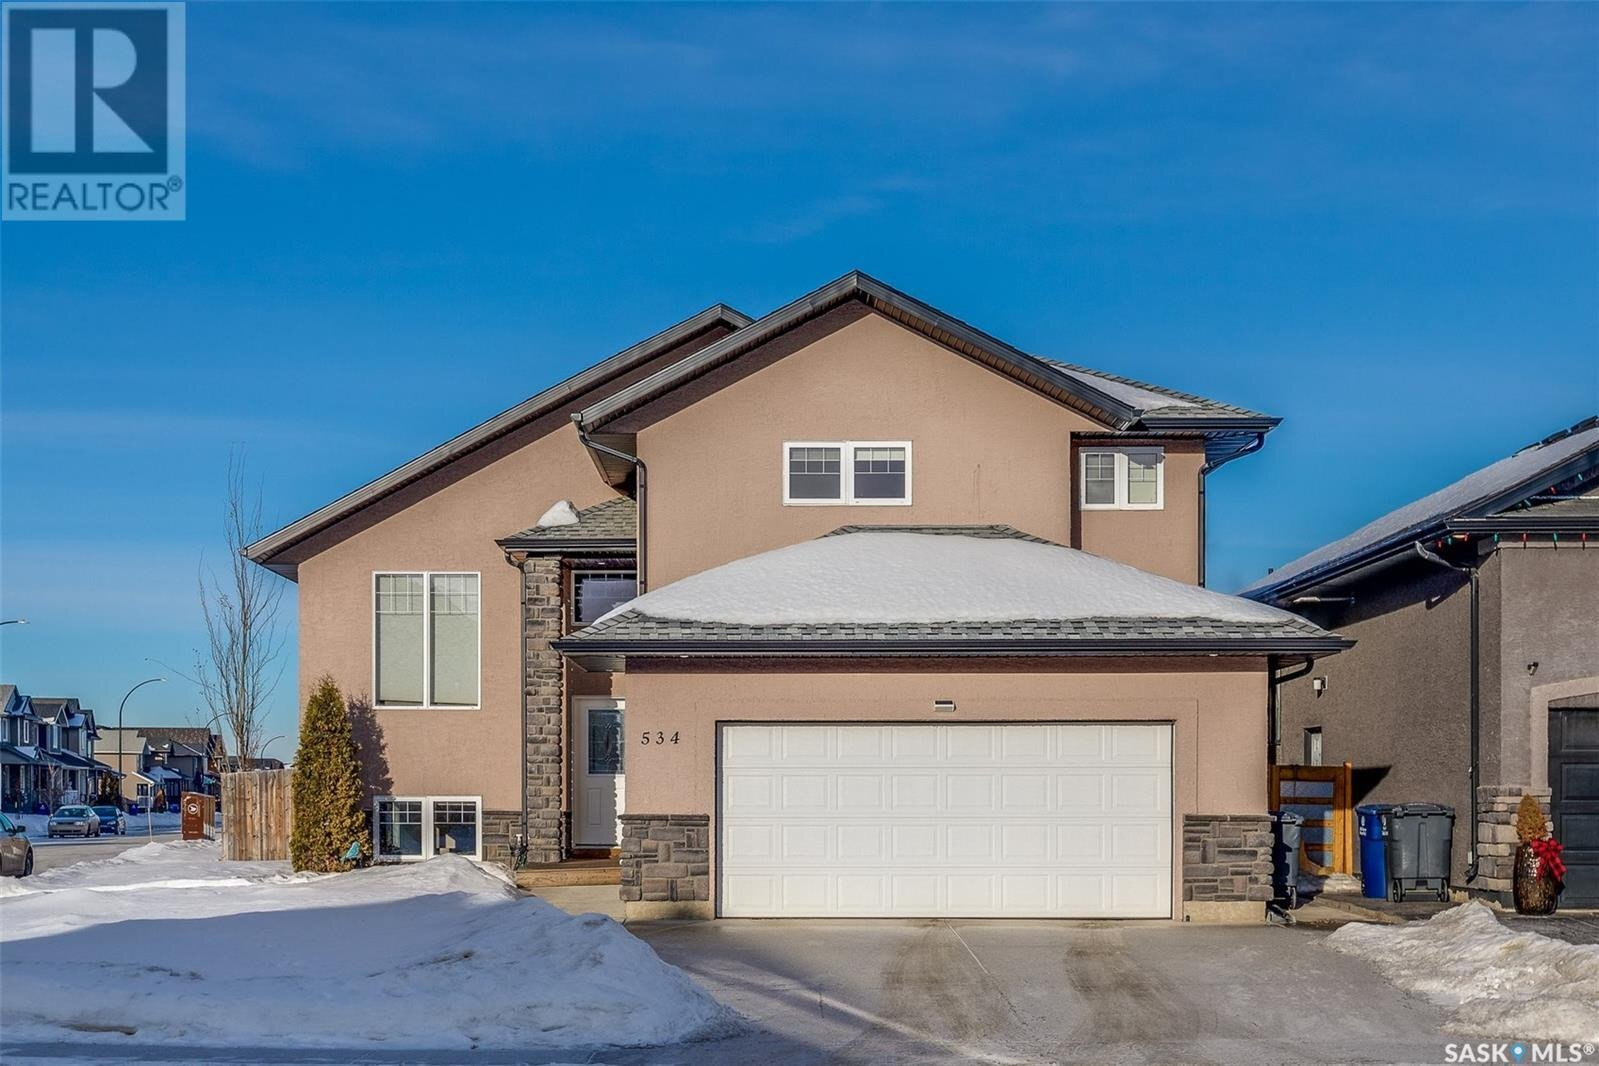 House for sale at 534 Willowgrove By Saskatoon Saskatchewan - MLS: SK838553